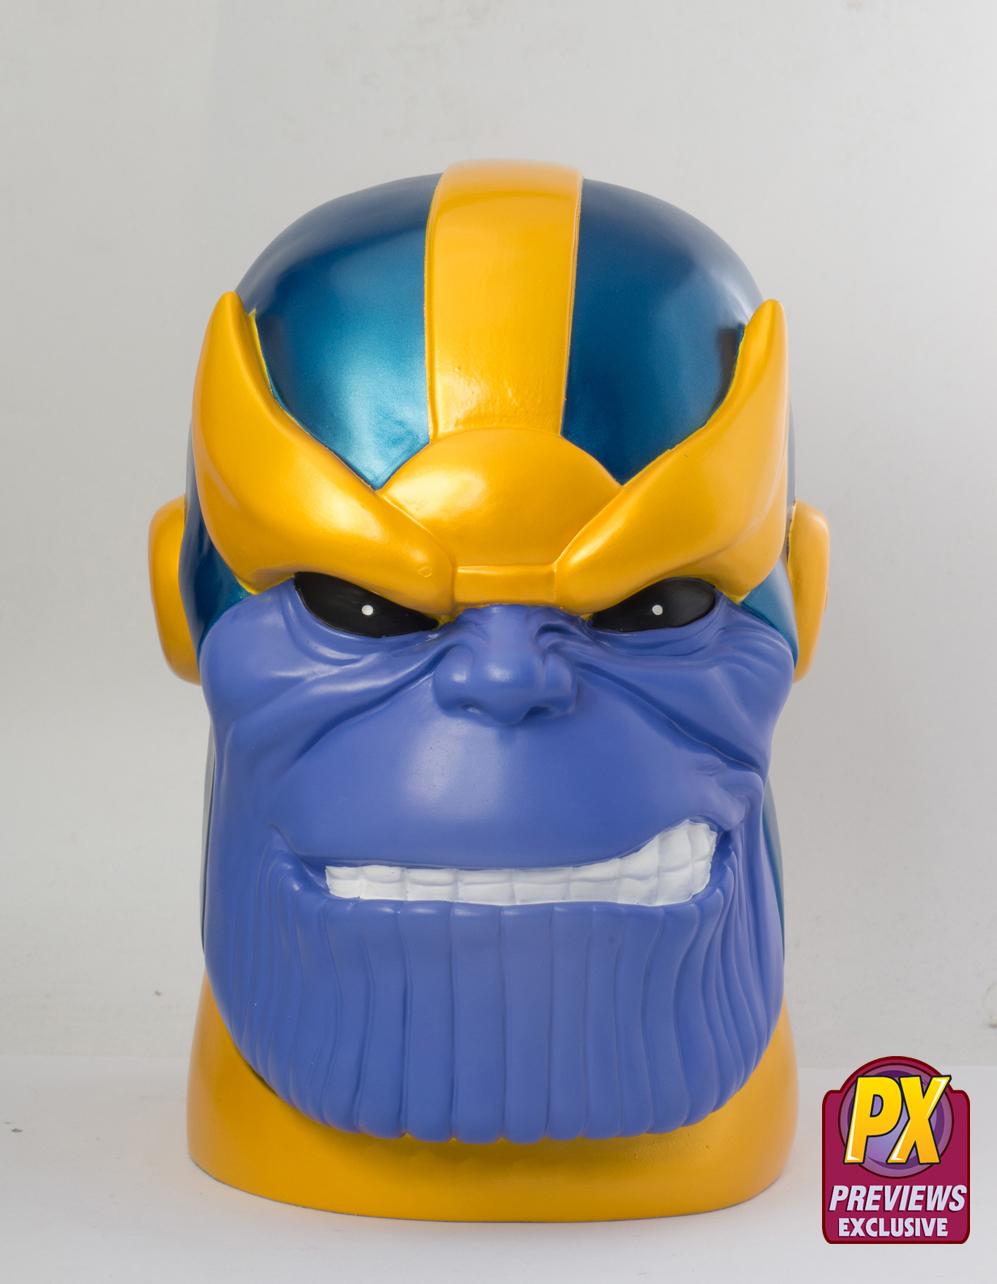 Make Mad Titan Money With A Thanos Head Bank